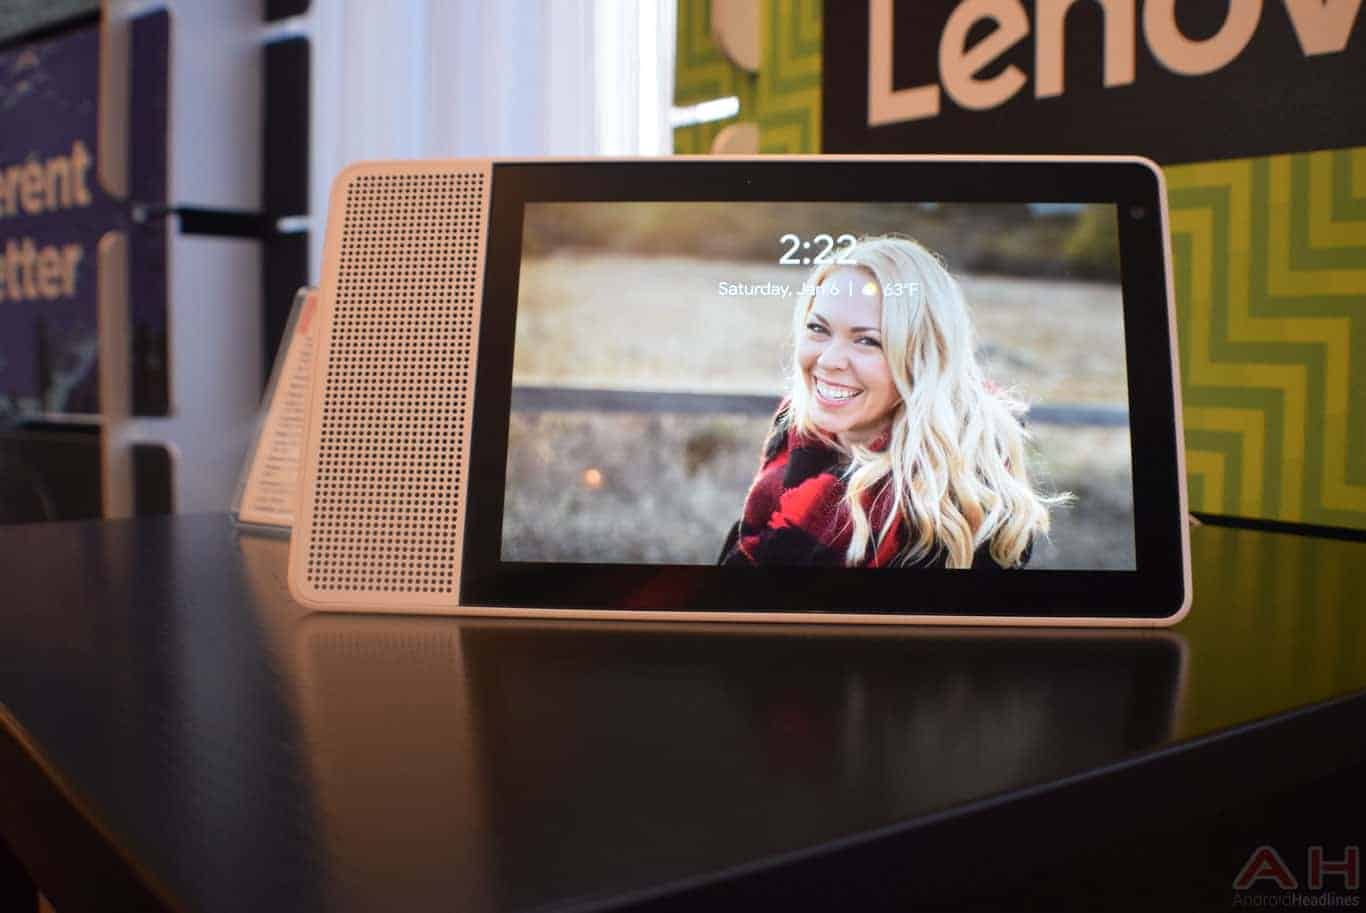 Lenovo Smart Display CES 2018 AM AH 0054